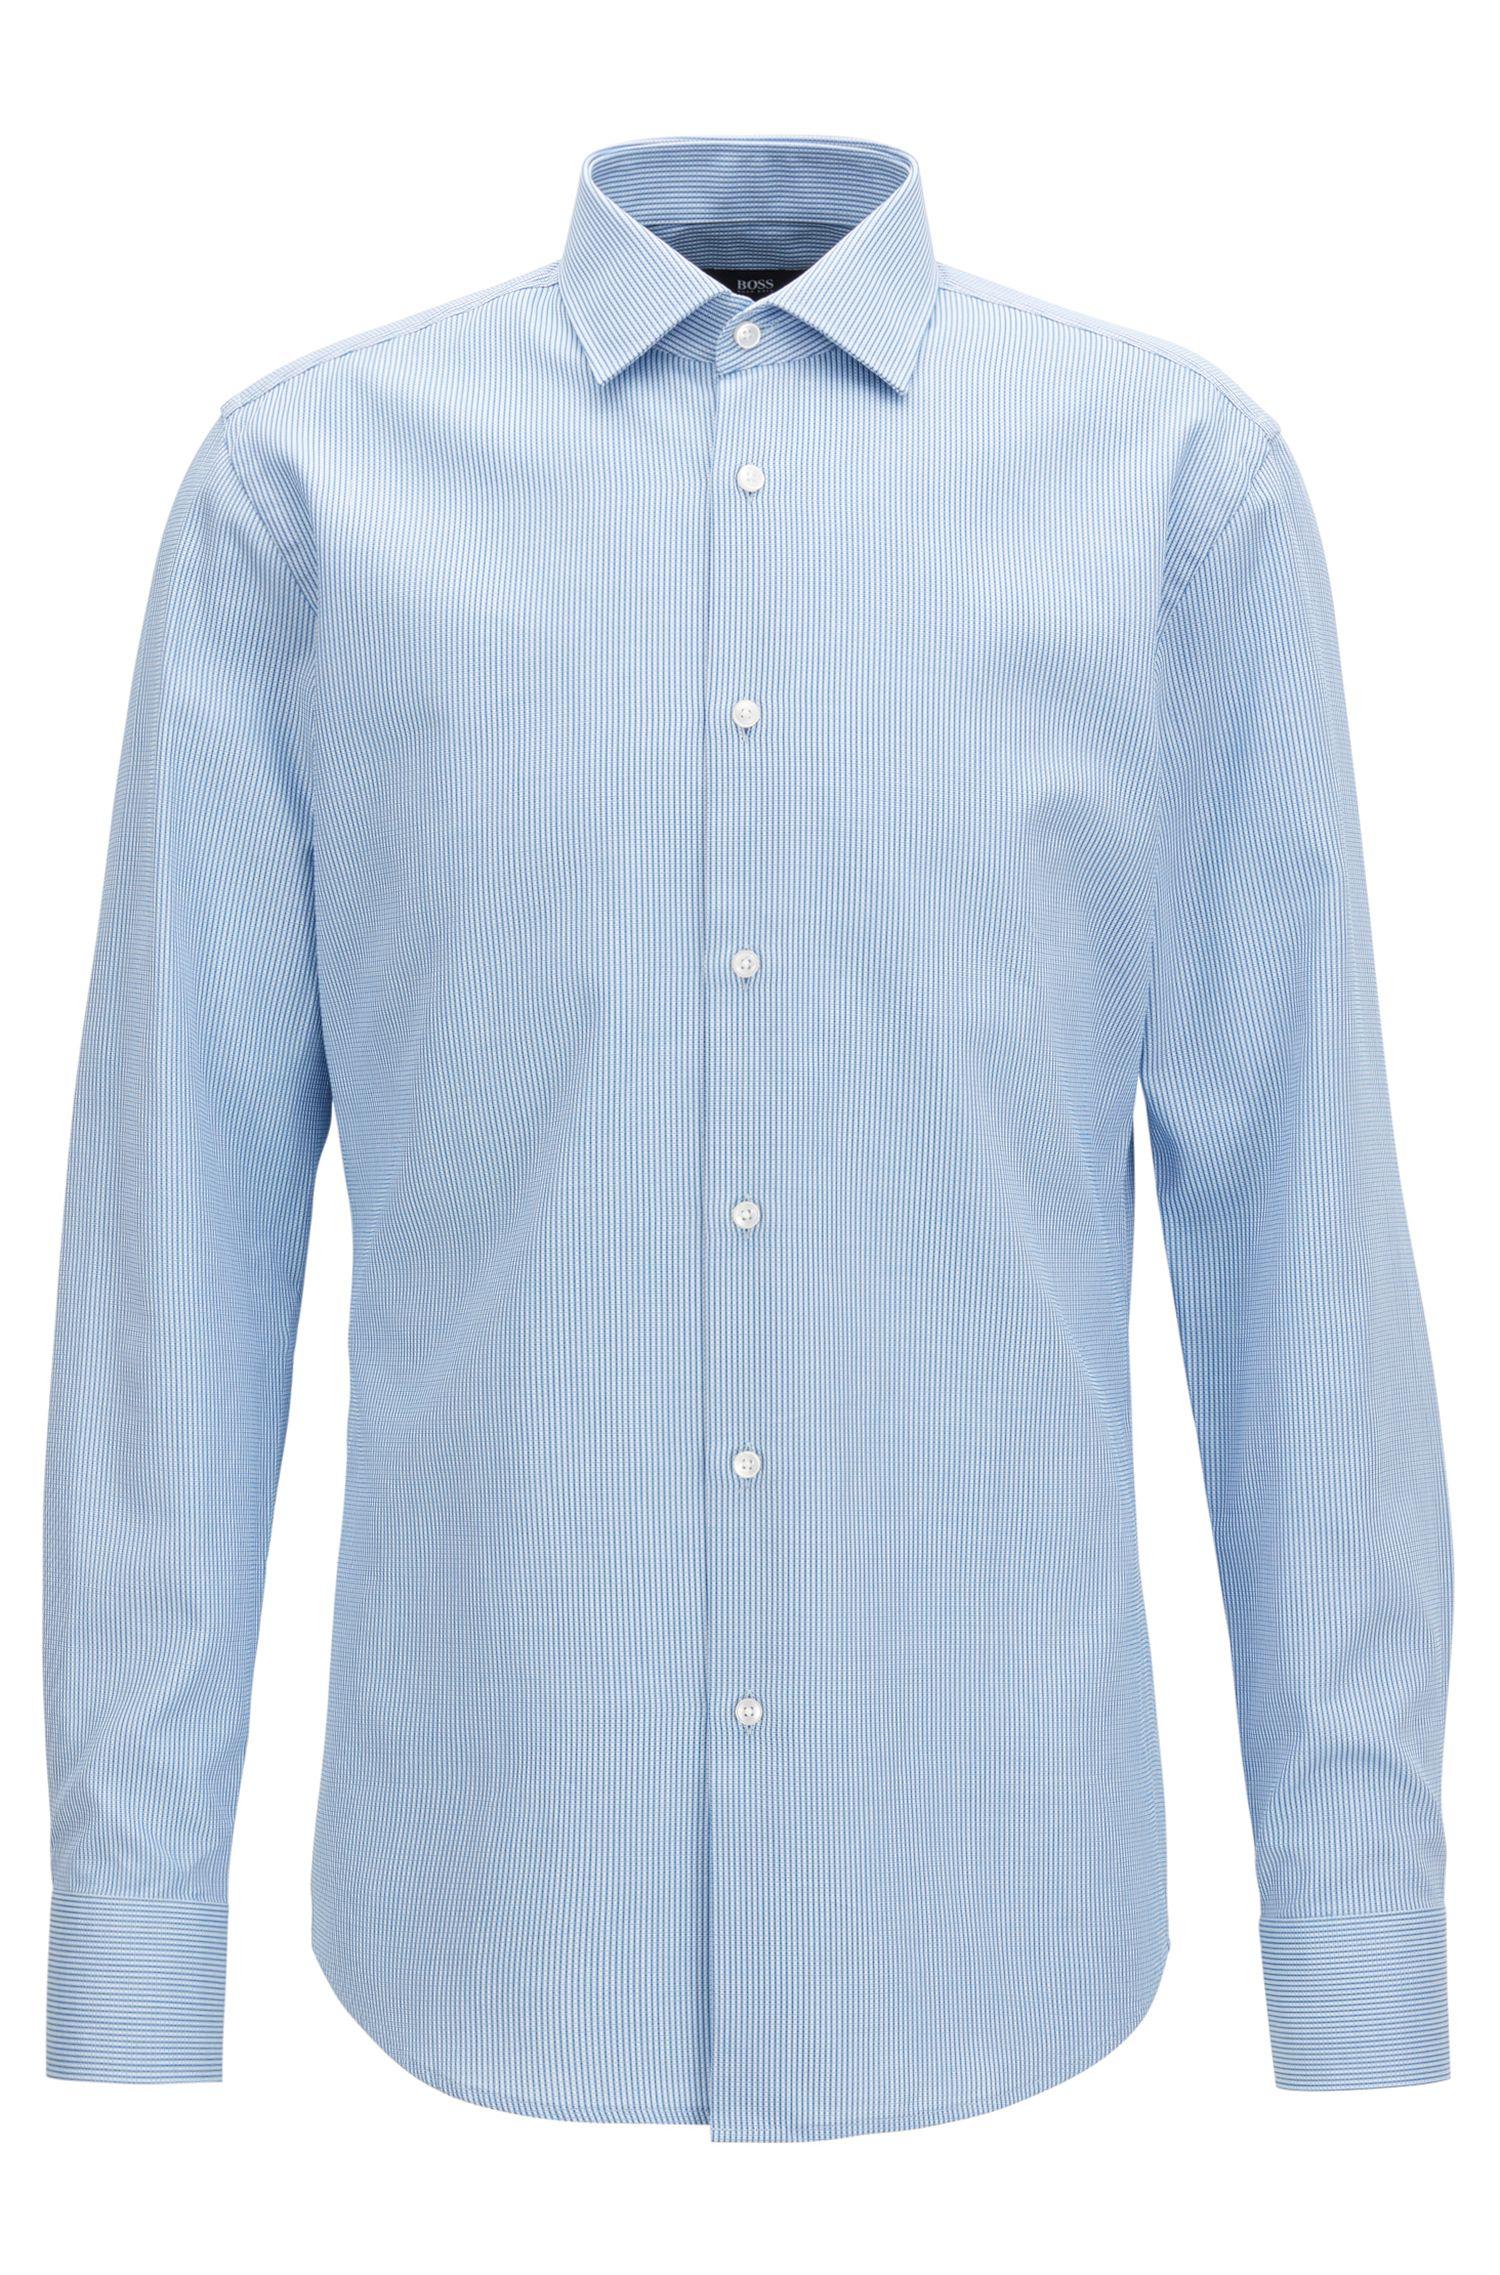 Striped Cotton Dress Shirt, Slim Fit | Jenno